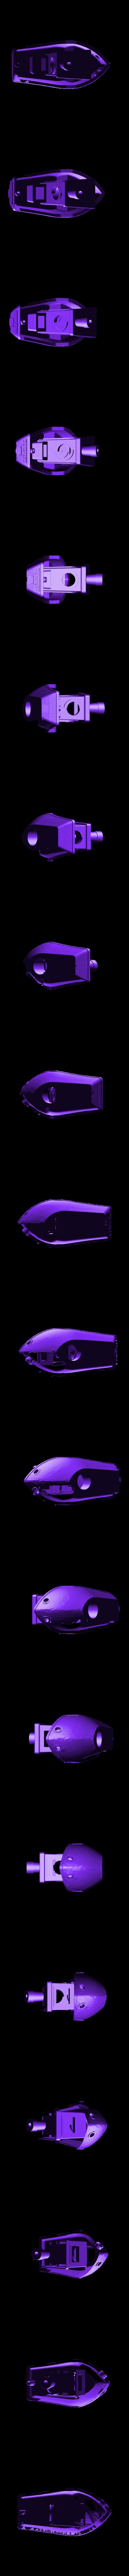 BenchyBody.stl Download free STL file AngelBenchyTreeTopper • 3D printing model, Digitang3D